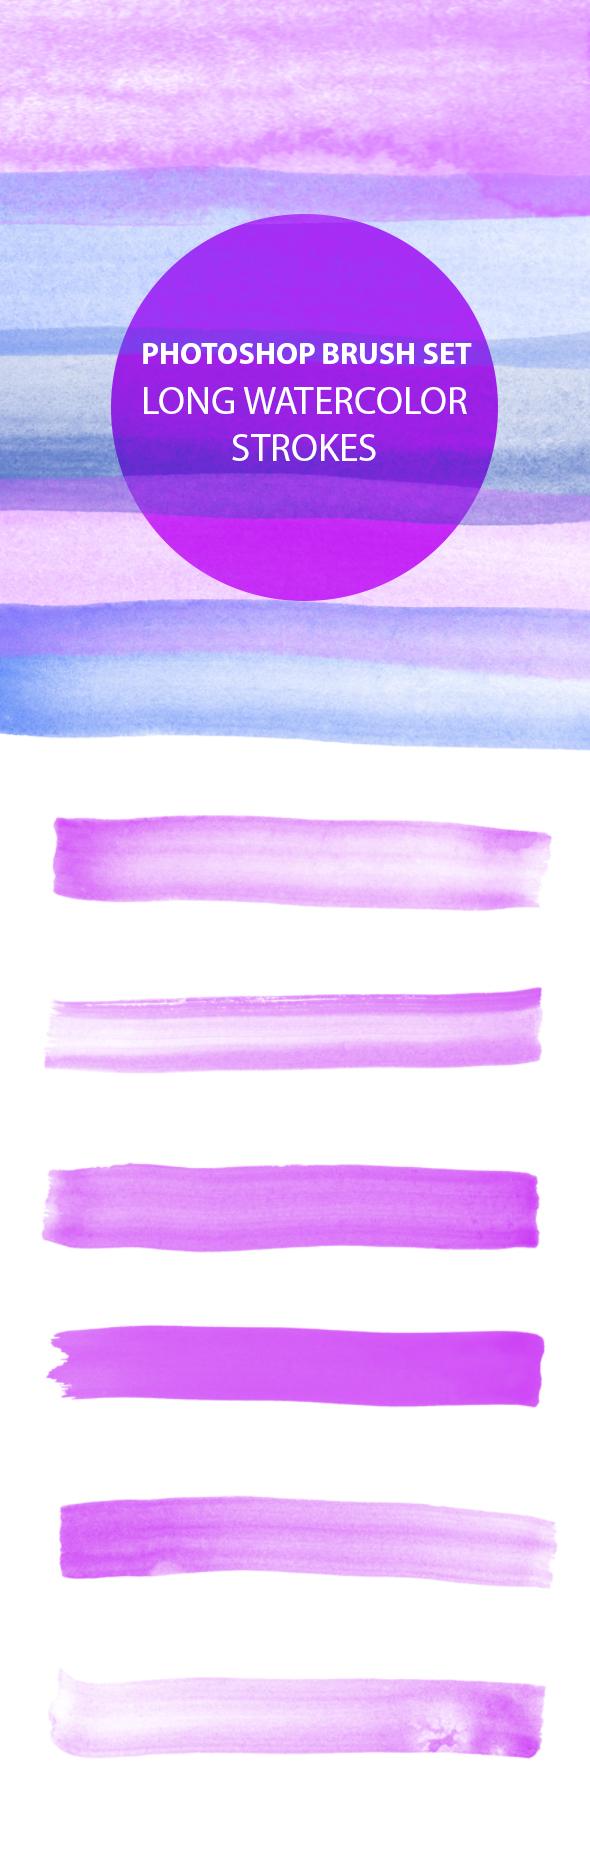 long-horizental-watercolor-strokes